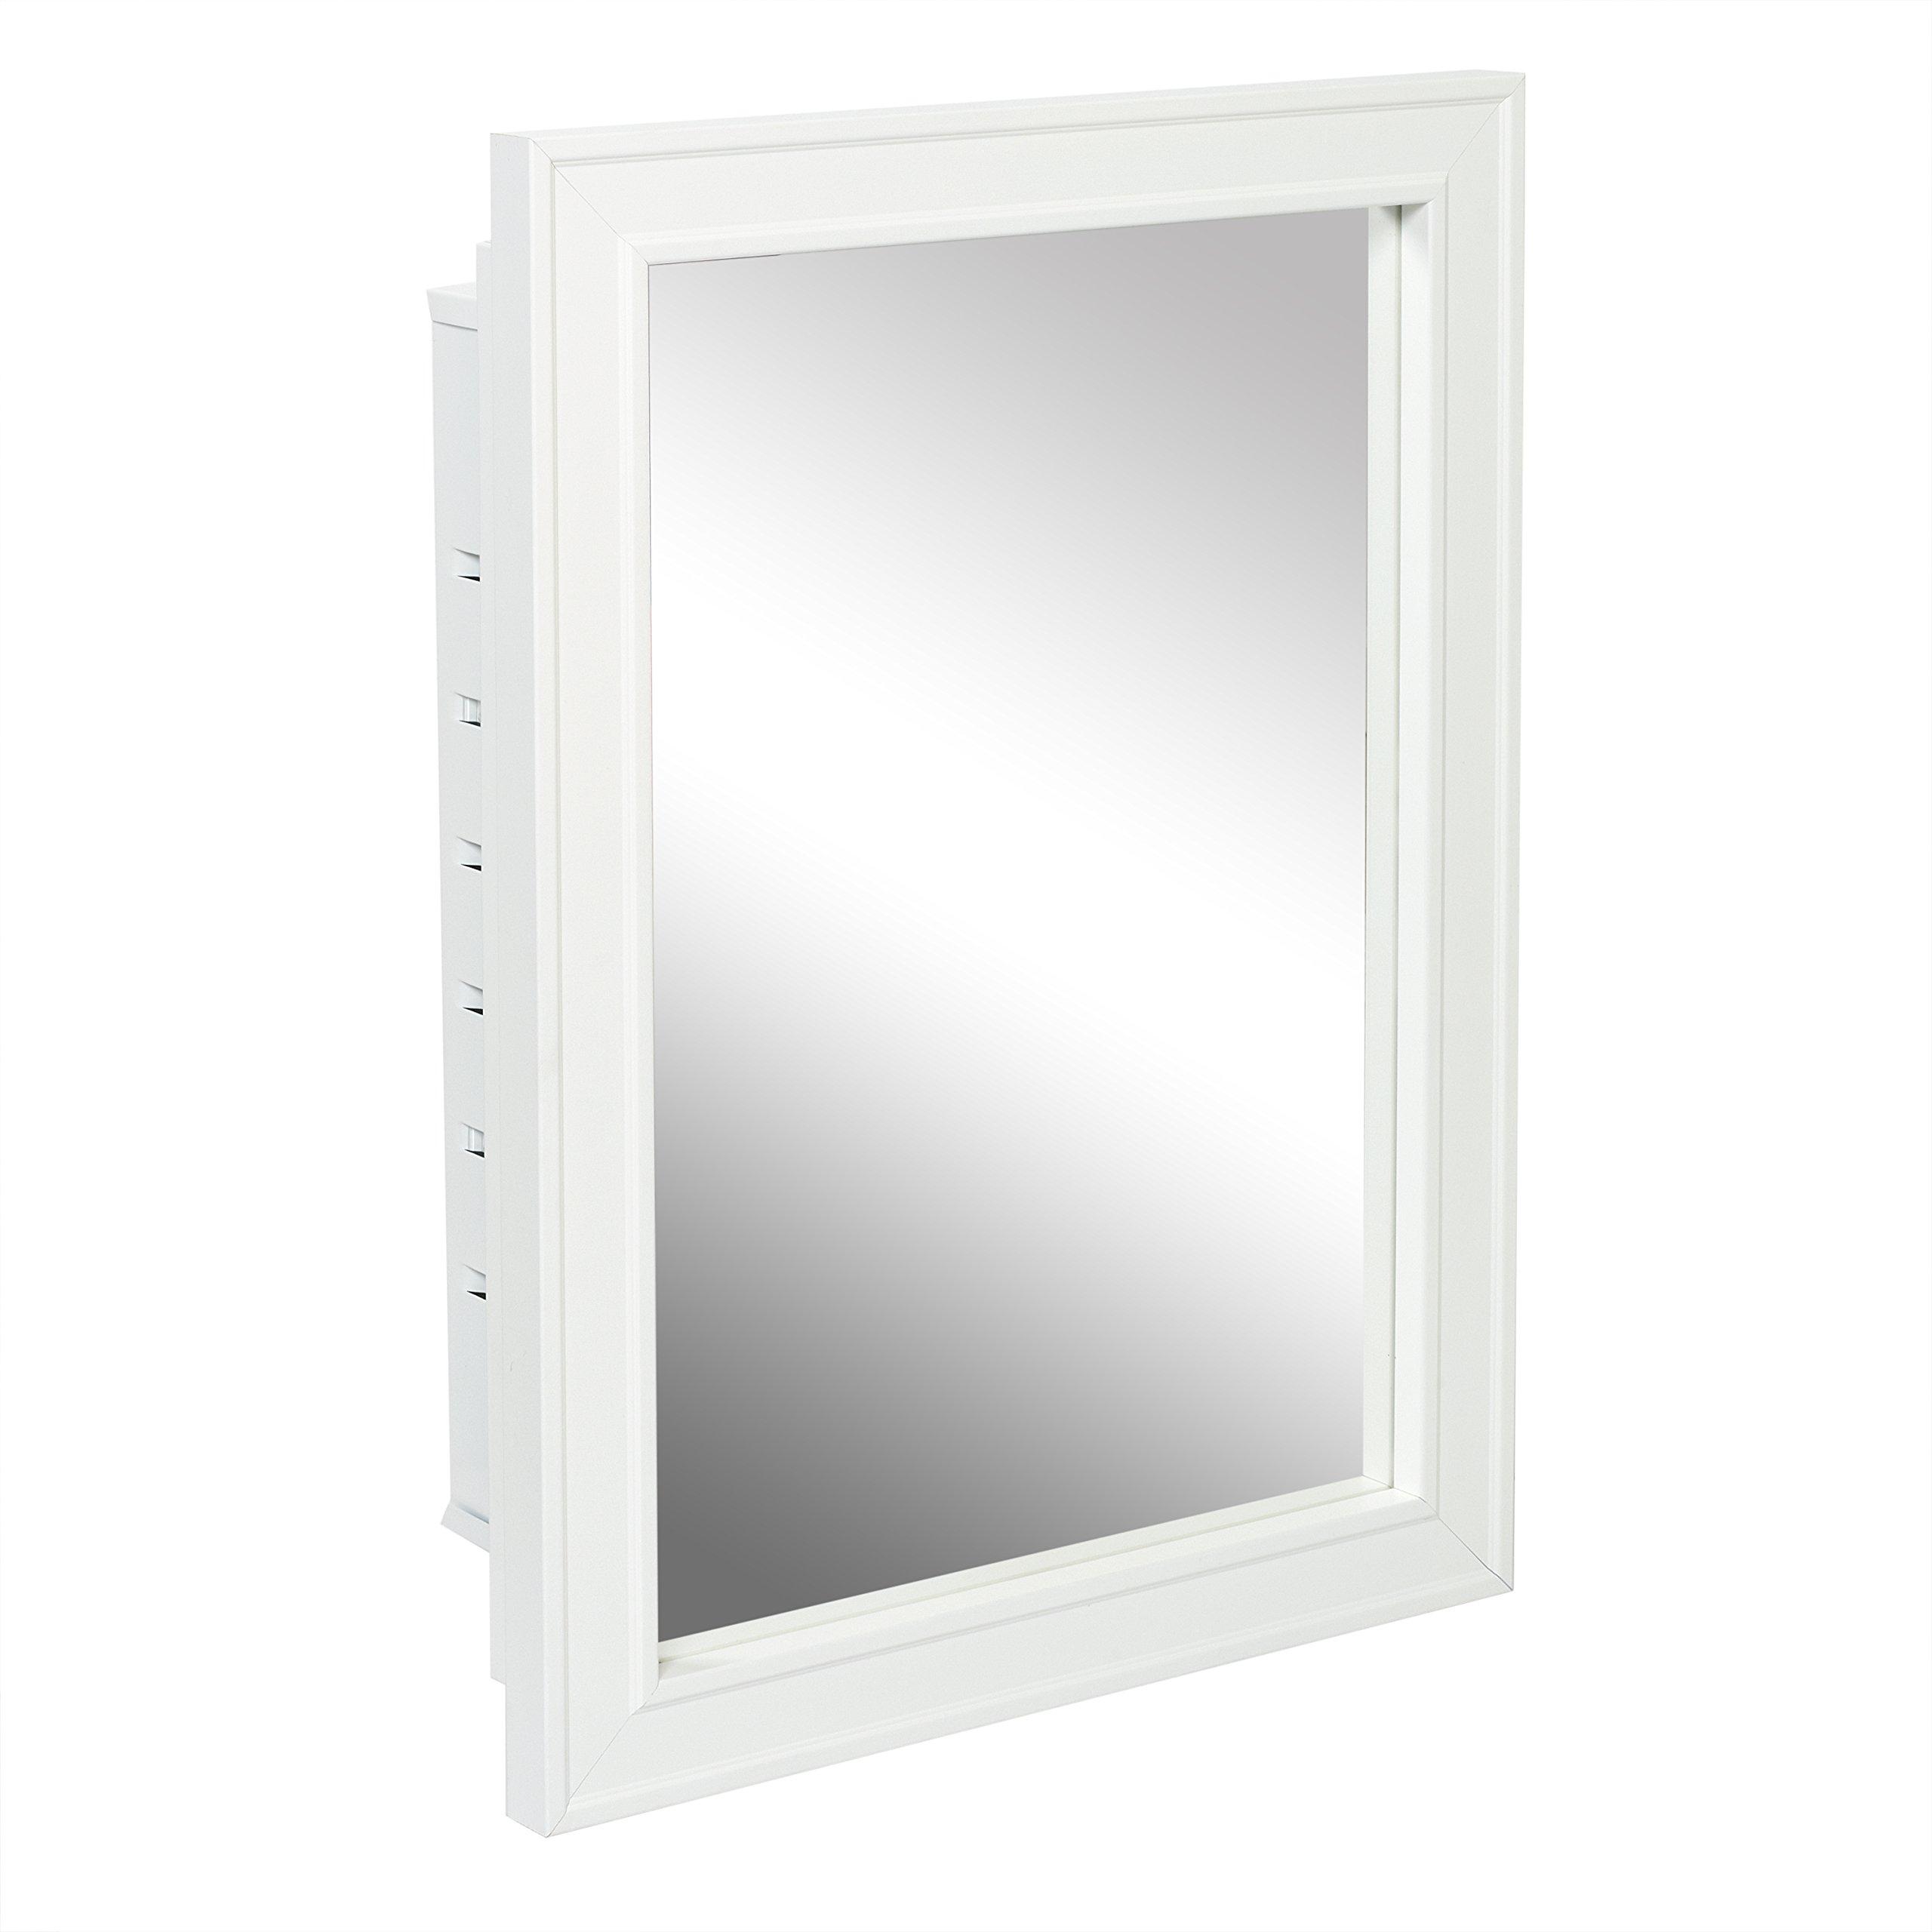 American Pride G9610R1W - Recessed White Wood Framed Mirror steel Tech Body Medicine Cabinet 16 inch x 22 inch